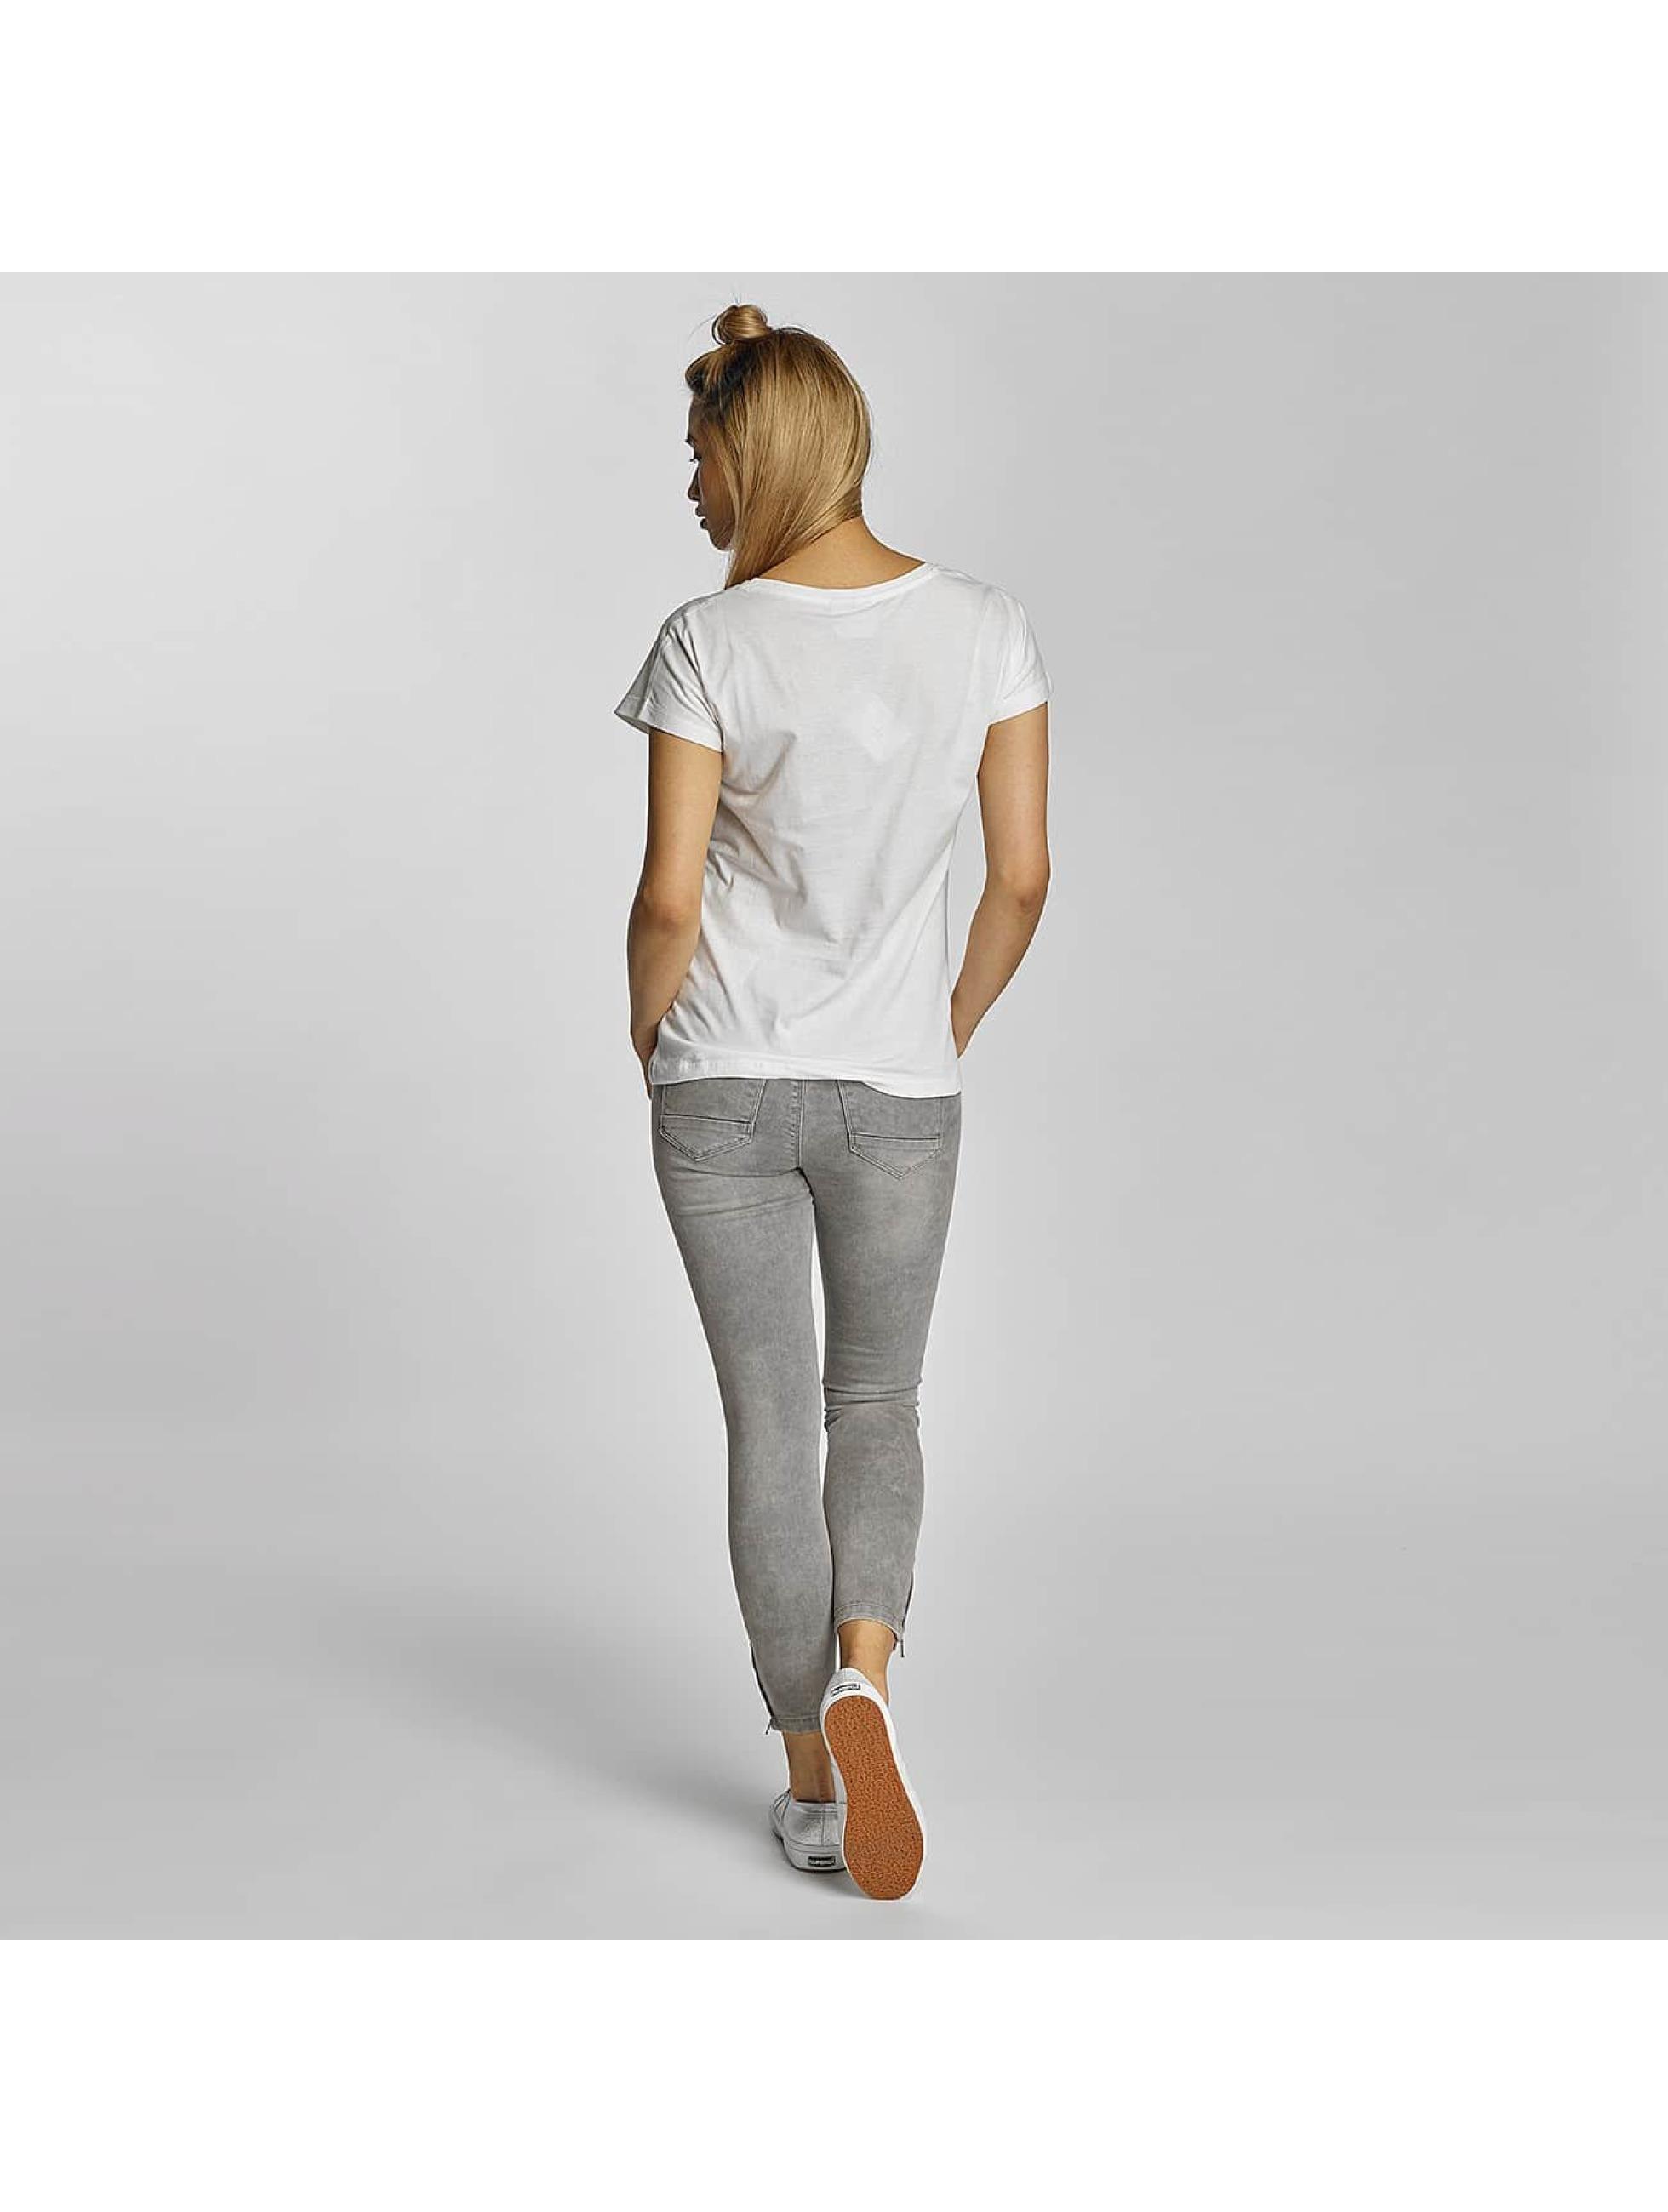 Vero Moda T-Shirt vmBella weiß